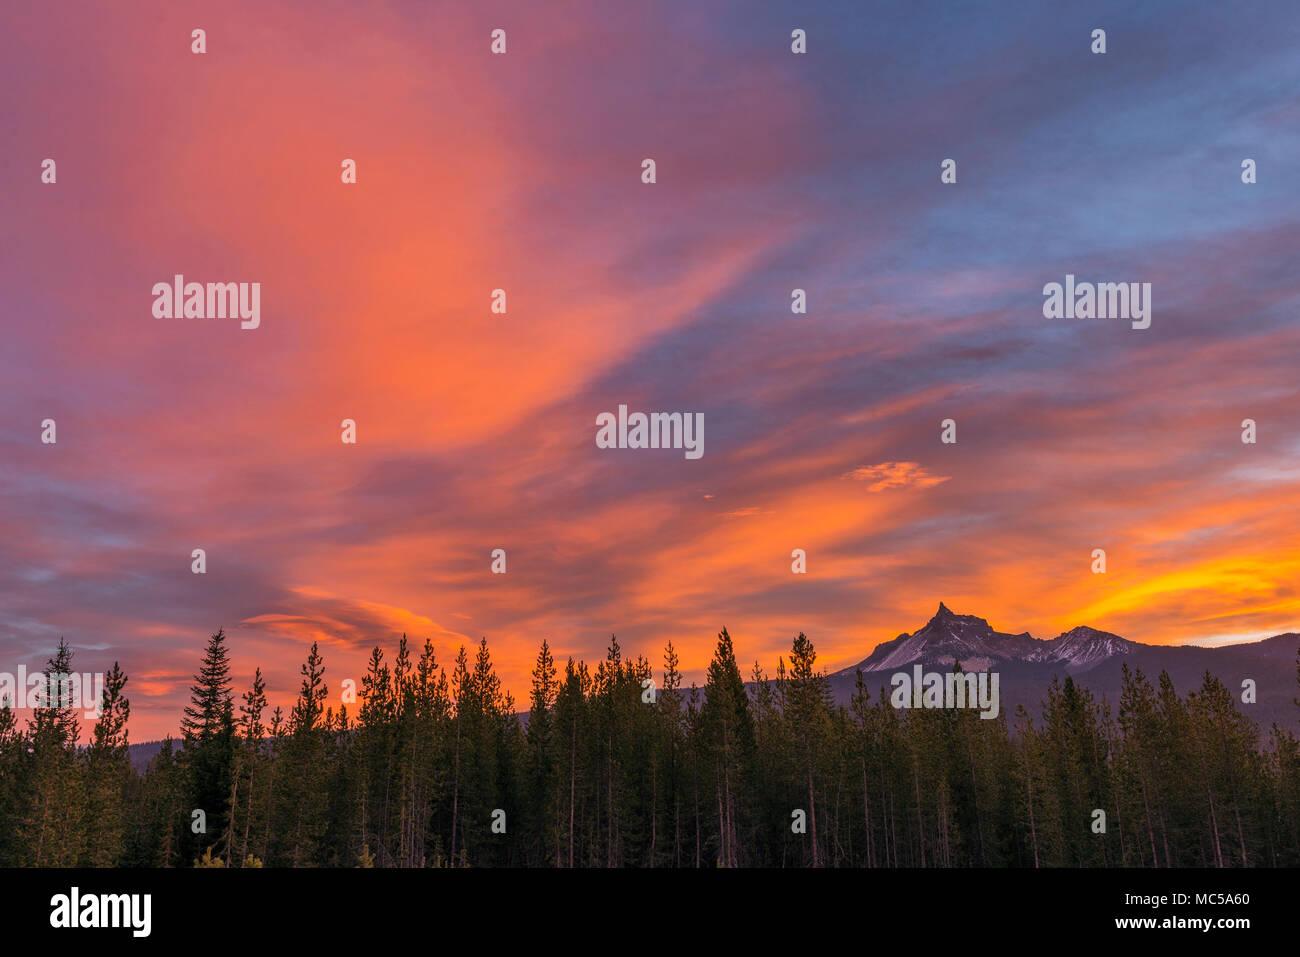 Dawn, Monte Thielsen, Monte Thielsen deserto, Umpqua National Forest, Oregon Immagini Stock